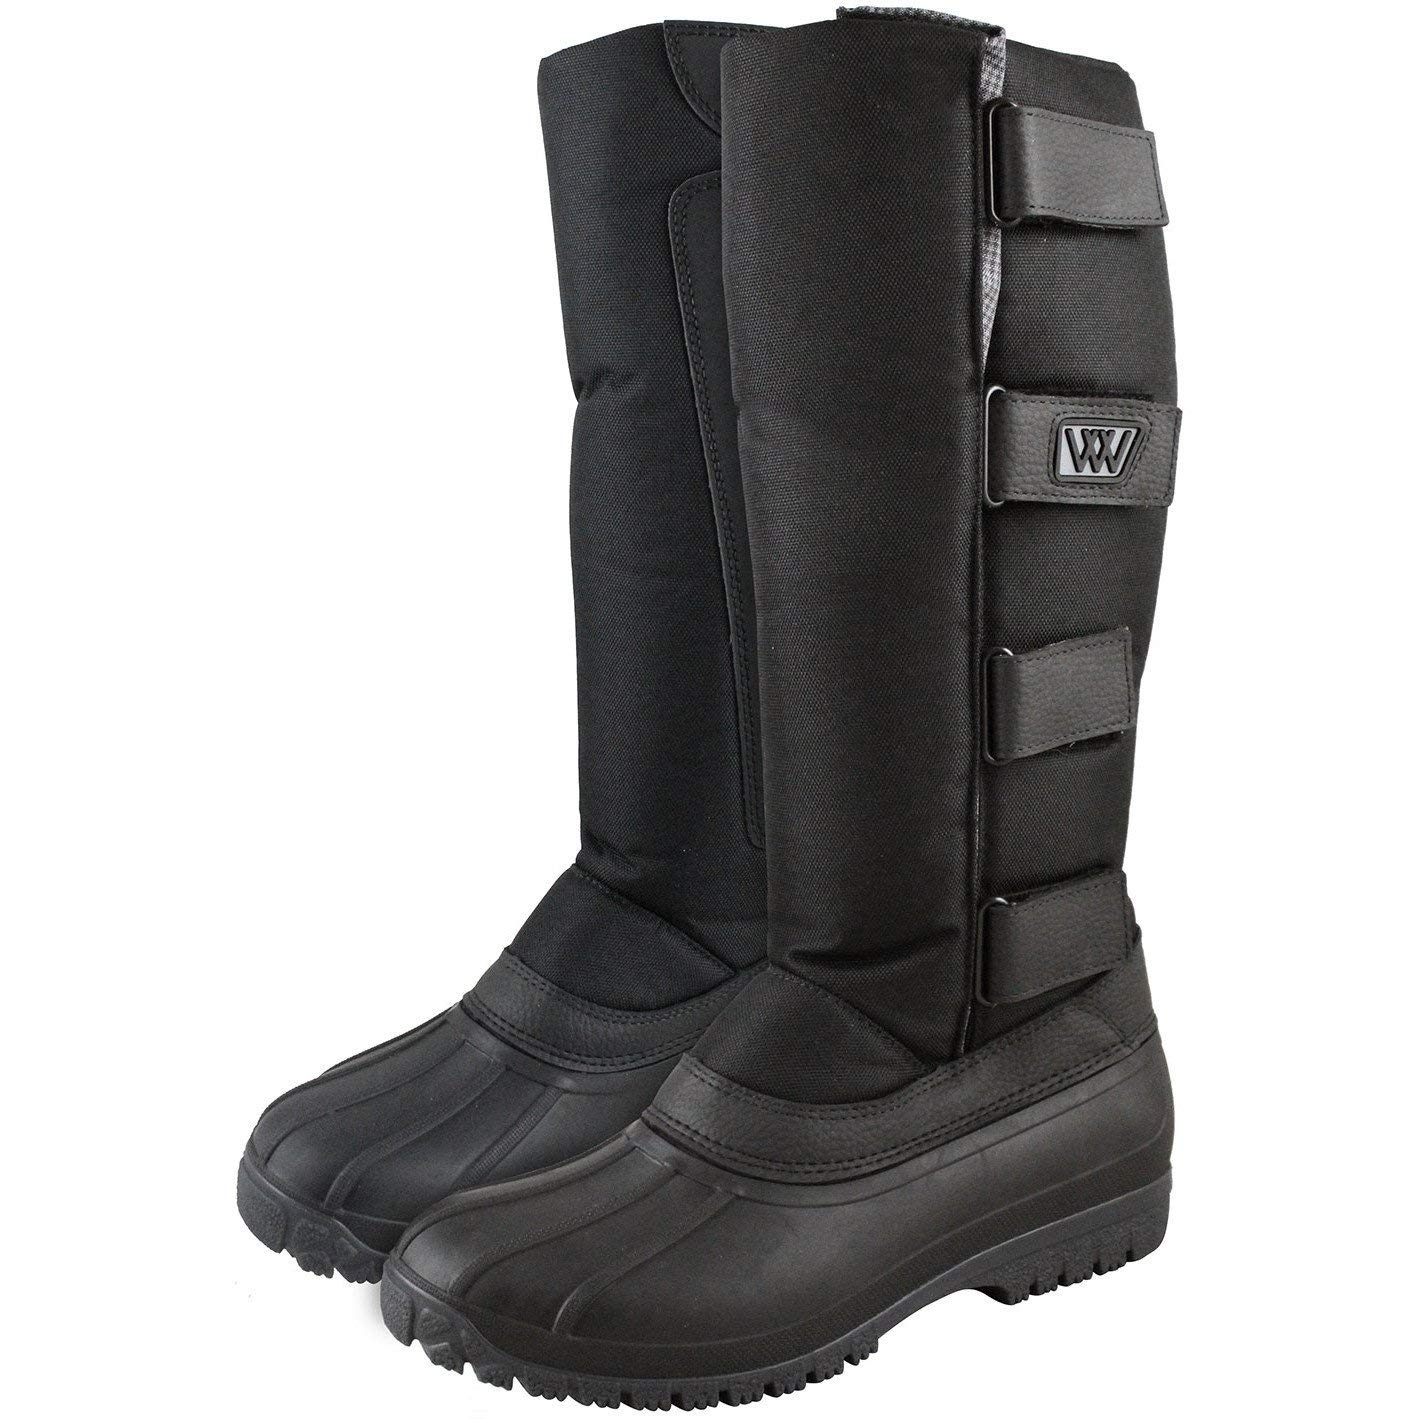 78fa45829c7 Woof Wear NEW Adult Long Yard Boots Black  Amazon.co.uk  Shoes   Bags